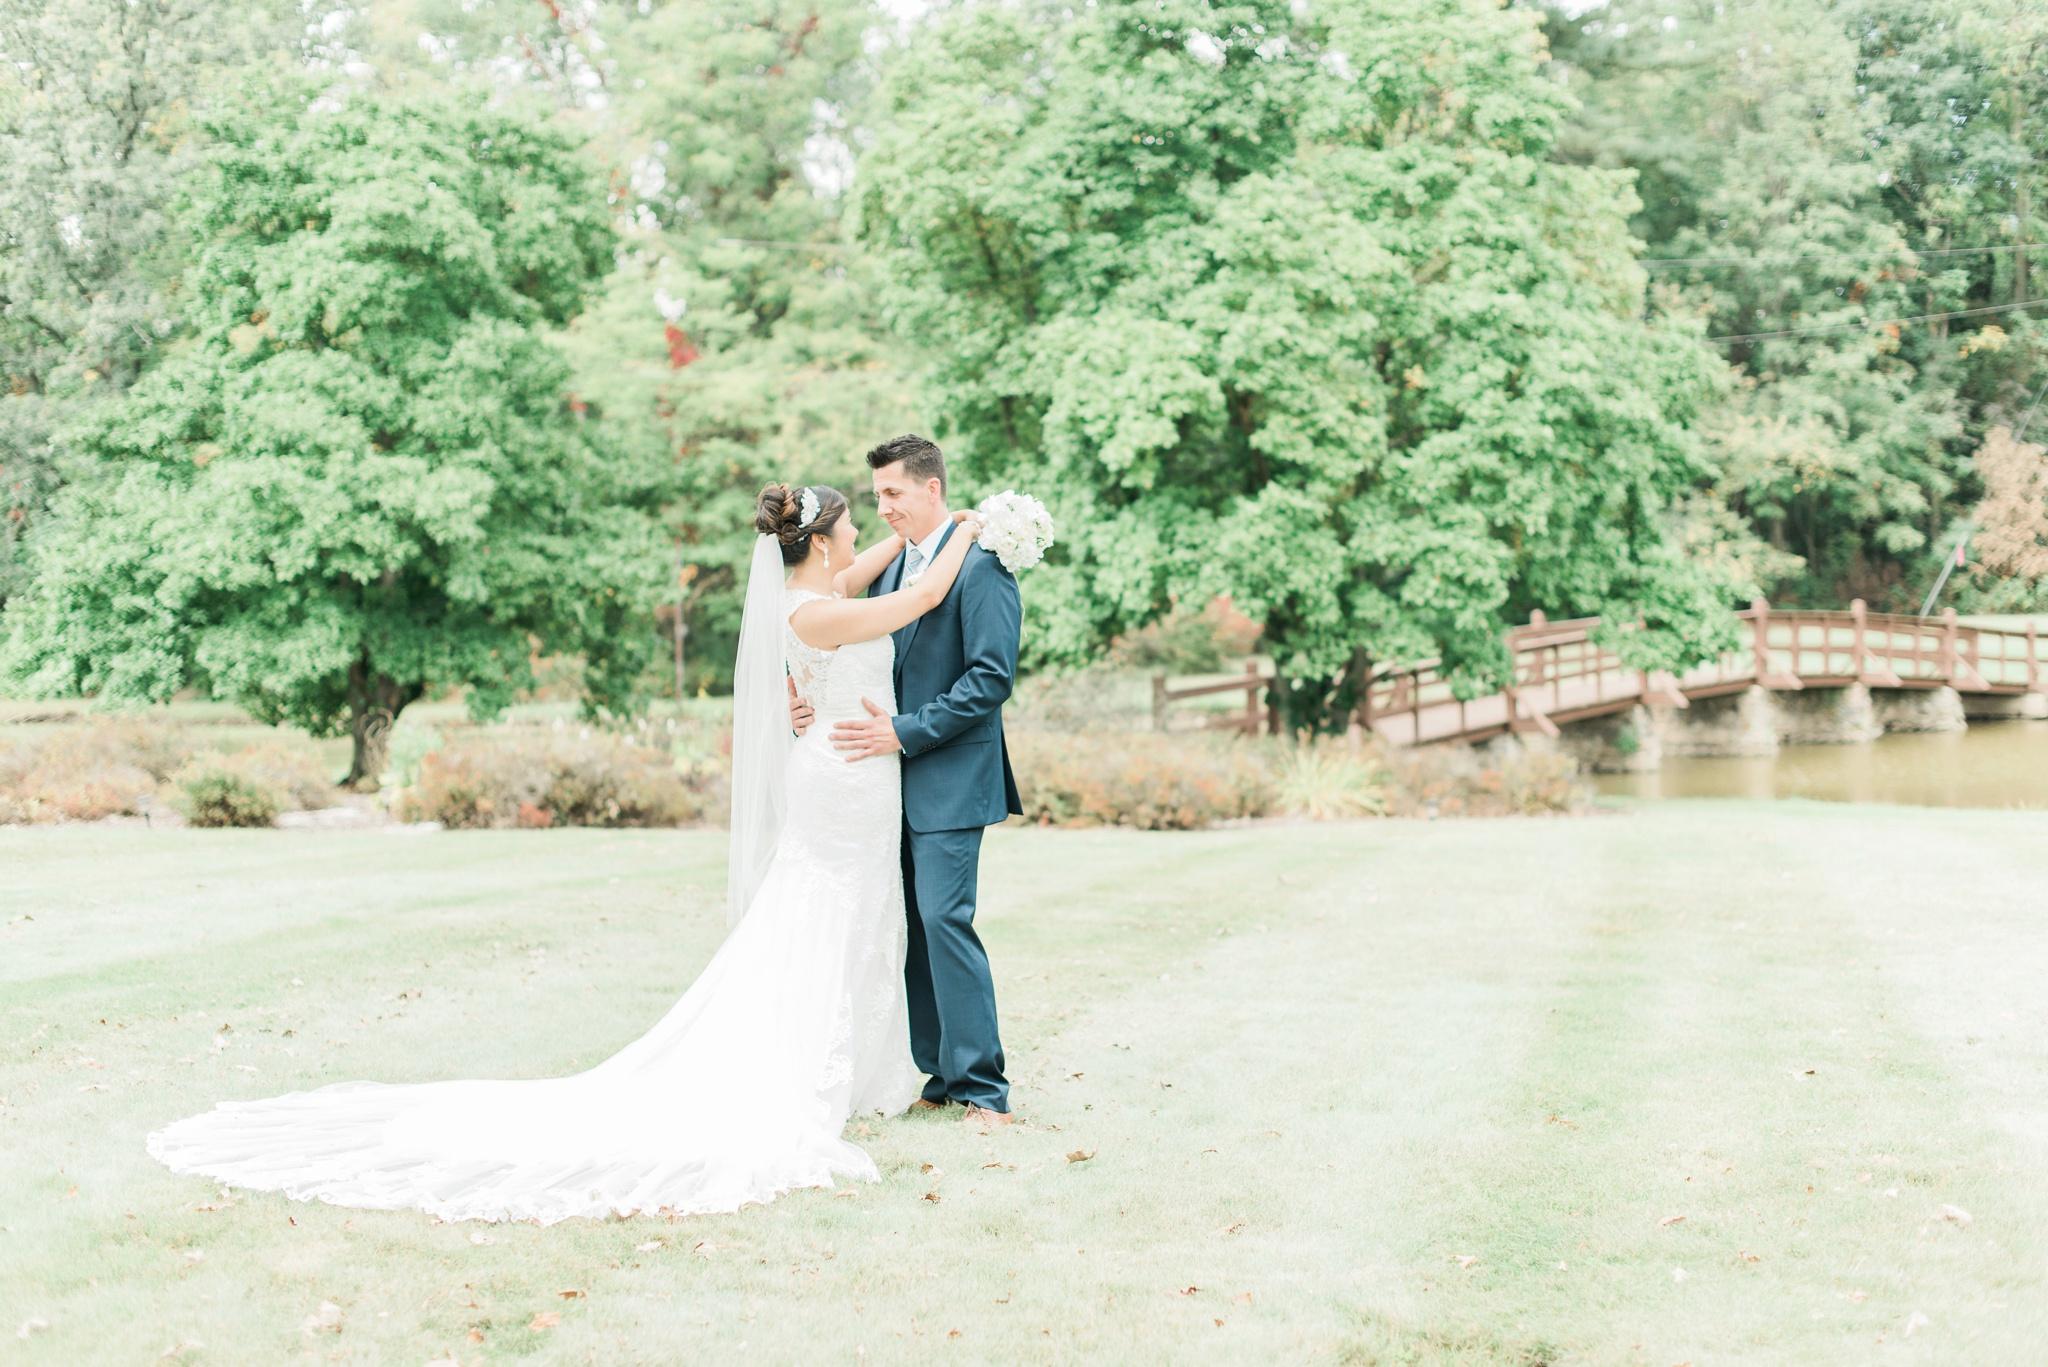 beverly-mansion-wedding-marengo-ohio-photographer_0026.jpg